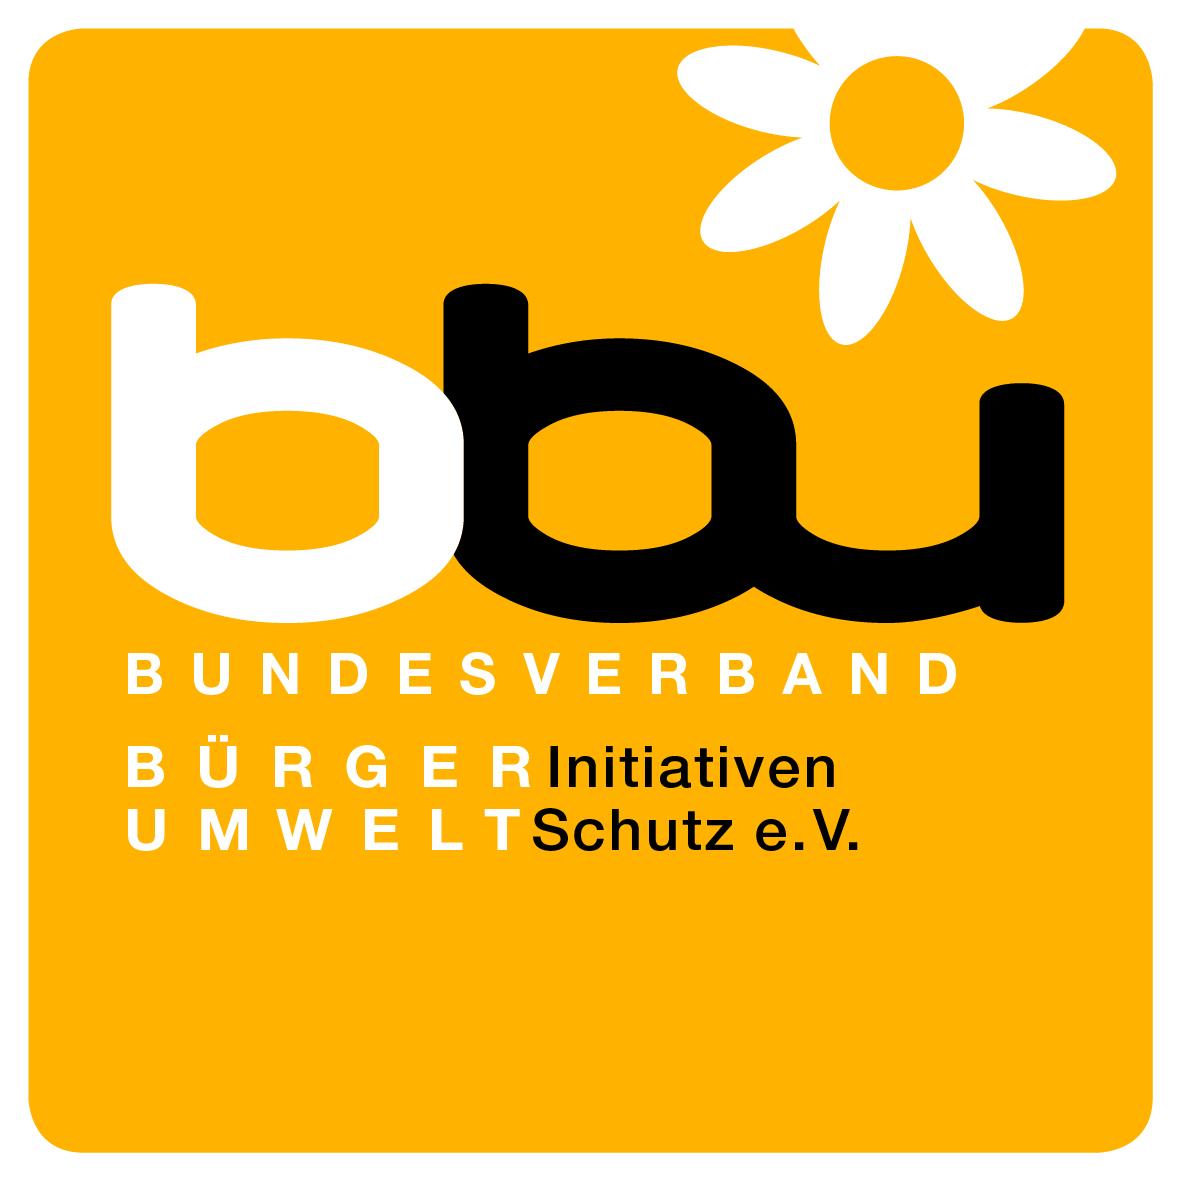 http://www.bbu-online.de/images/Logo/RZ_BBU_LOGO_4C.jpg